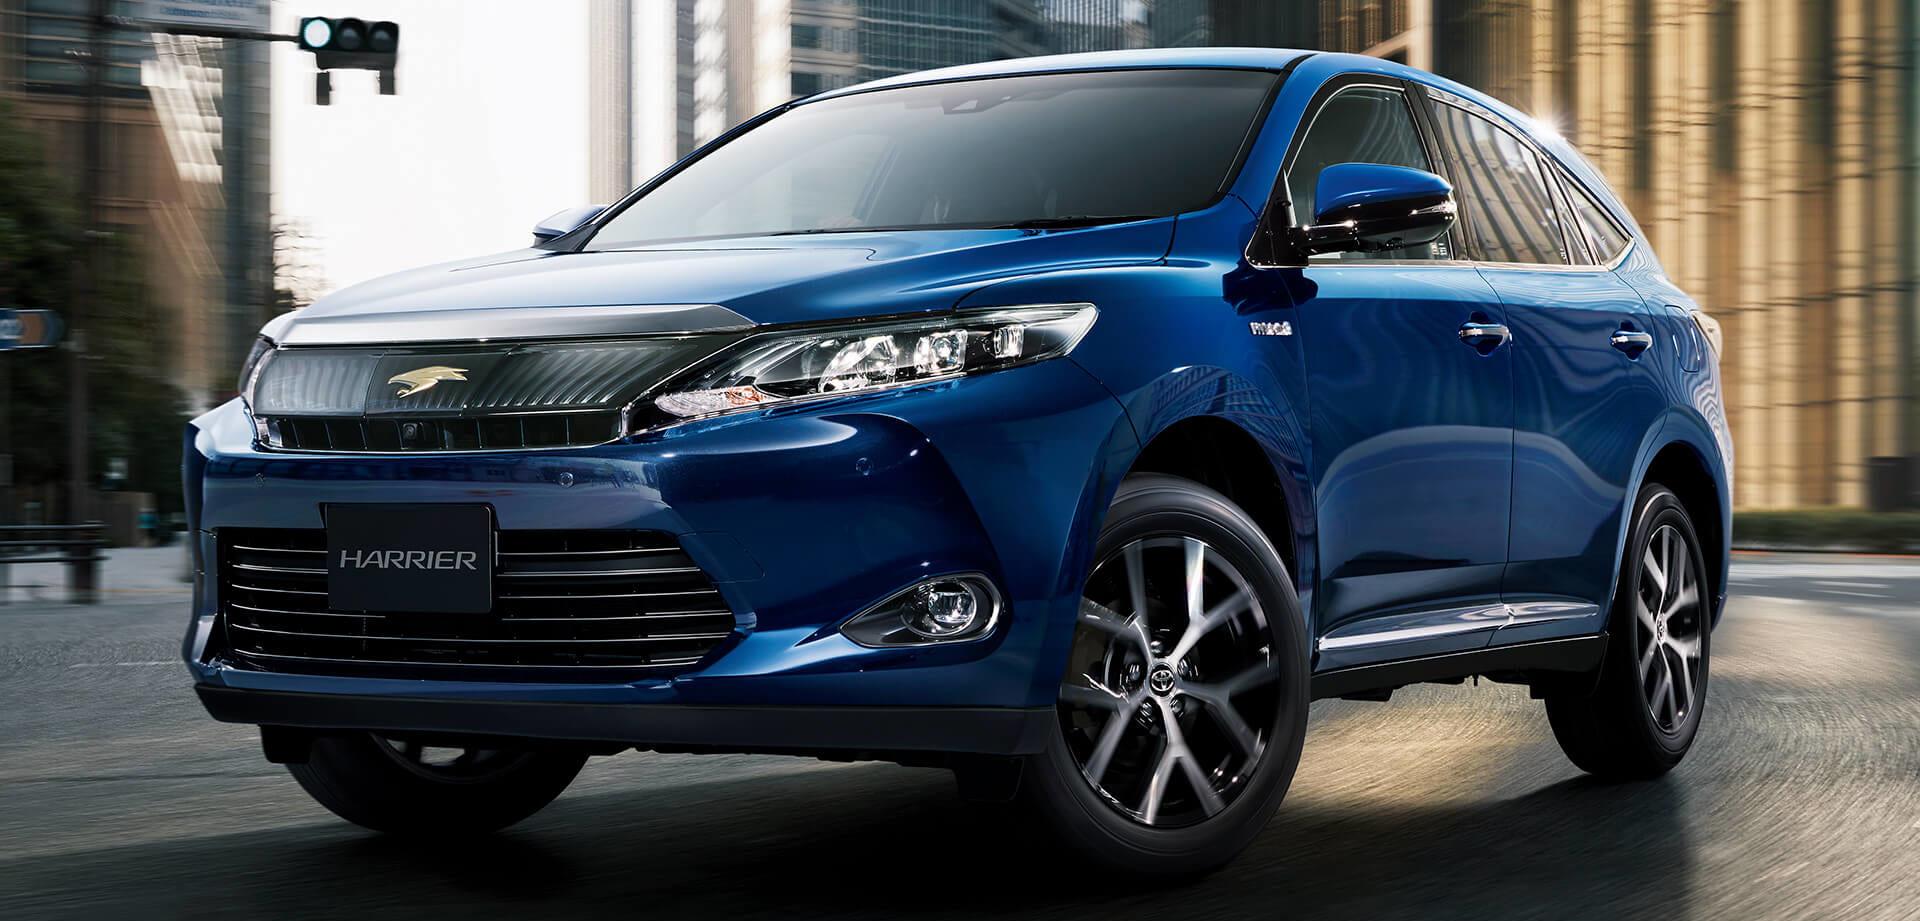 Toyota_harrier_DAA-AVU65W-ANXGB_image